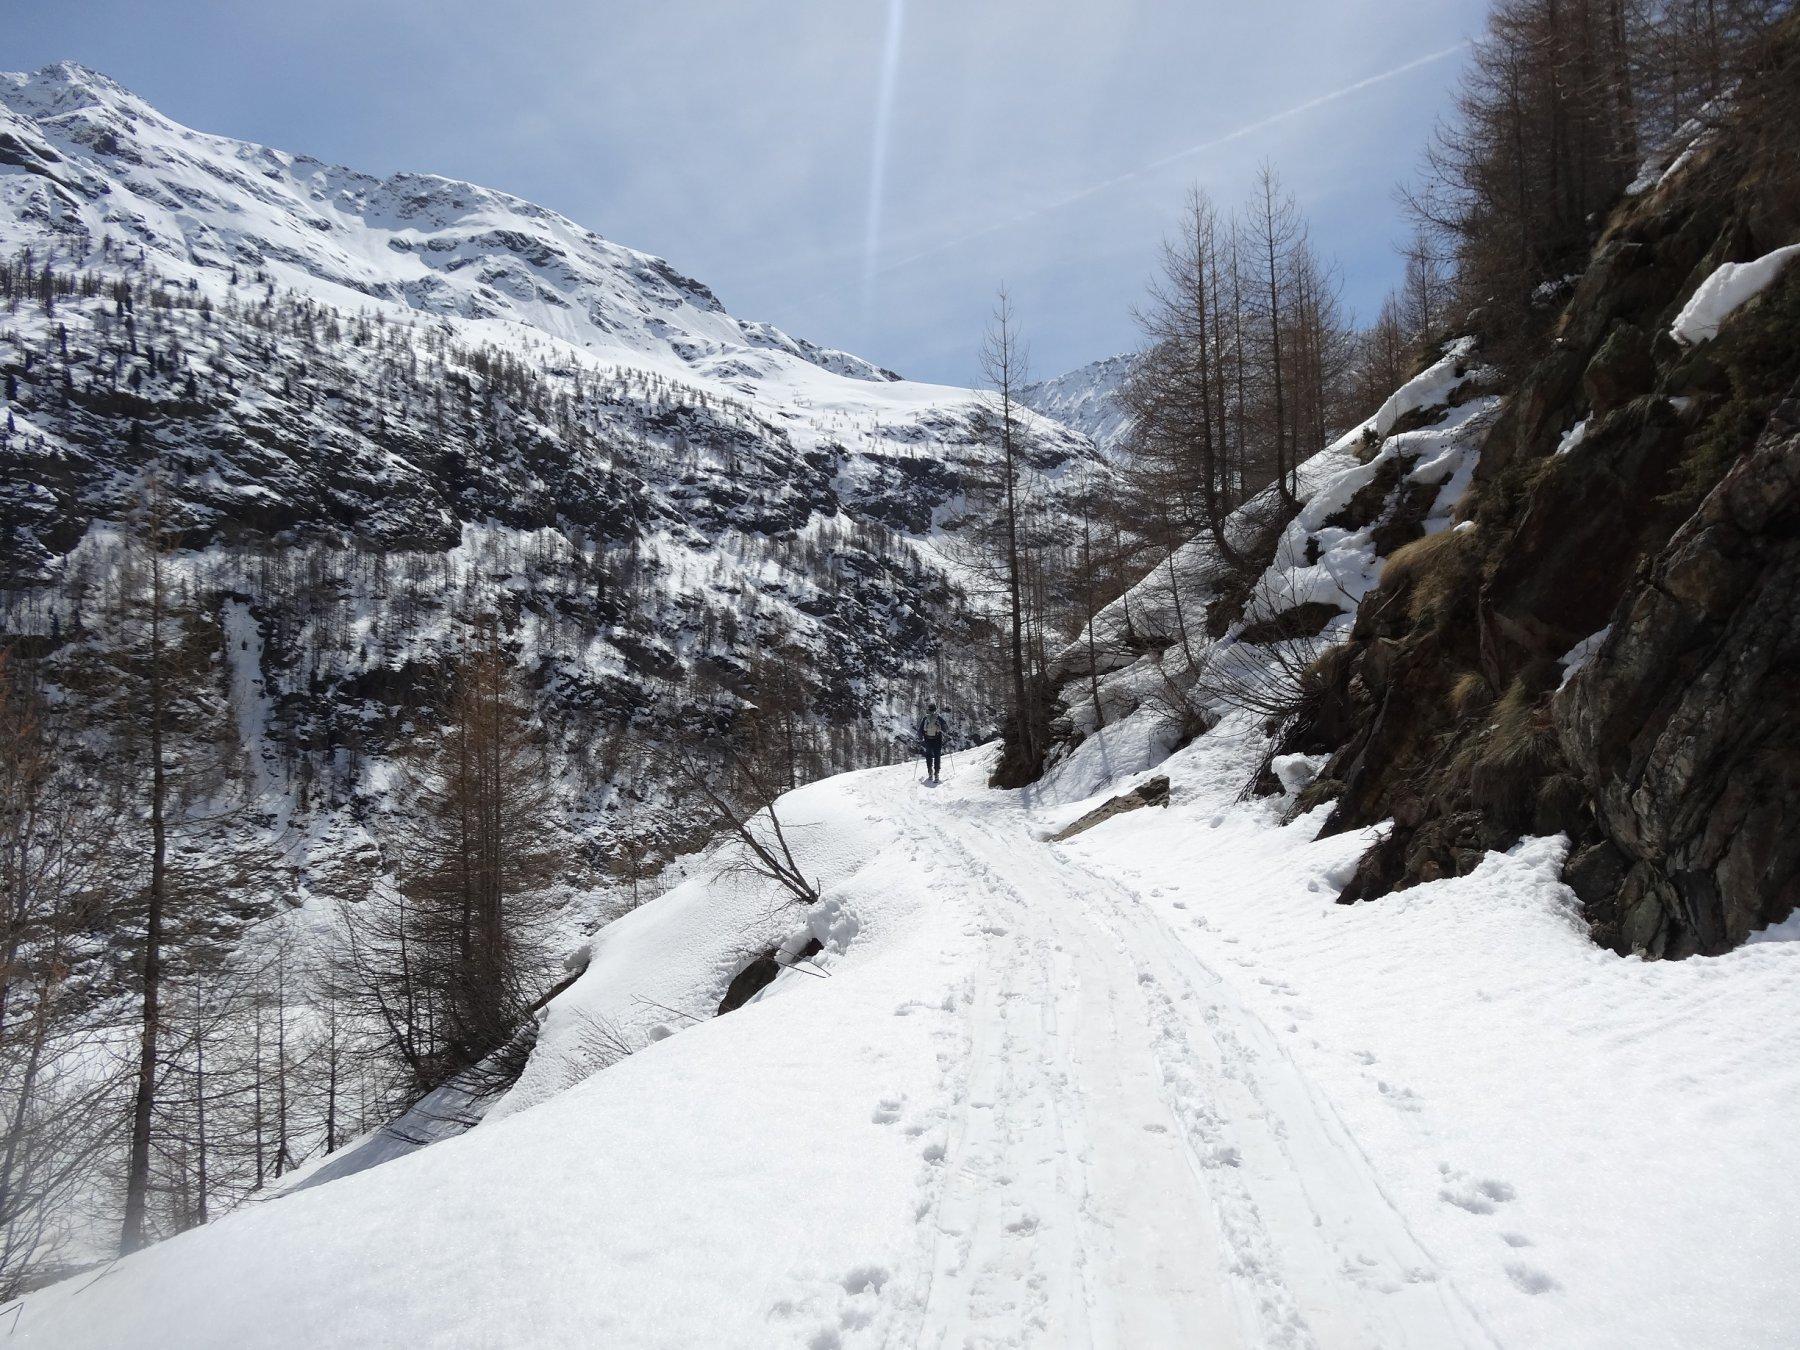 la strada lungo la diga